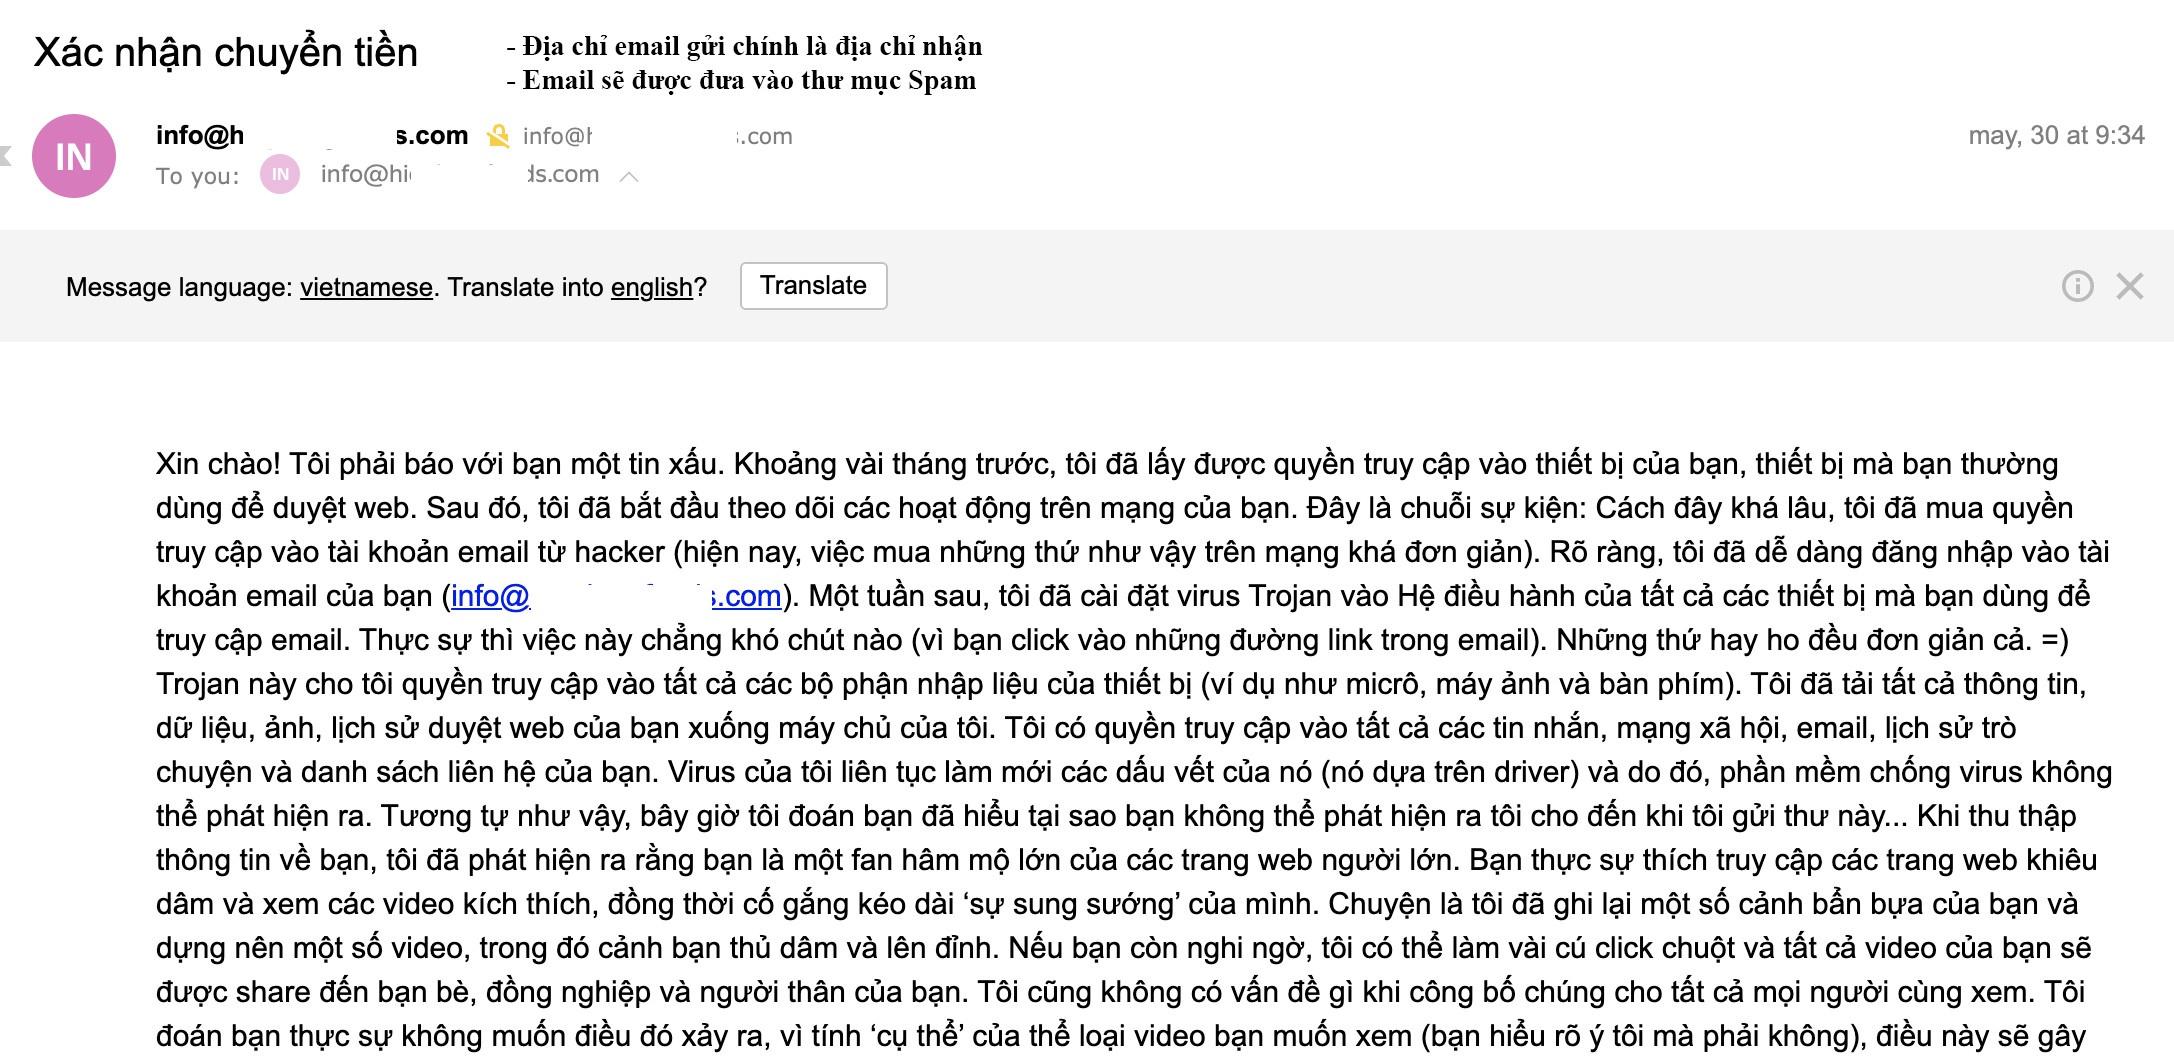 Tong tien qua email anh 1